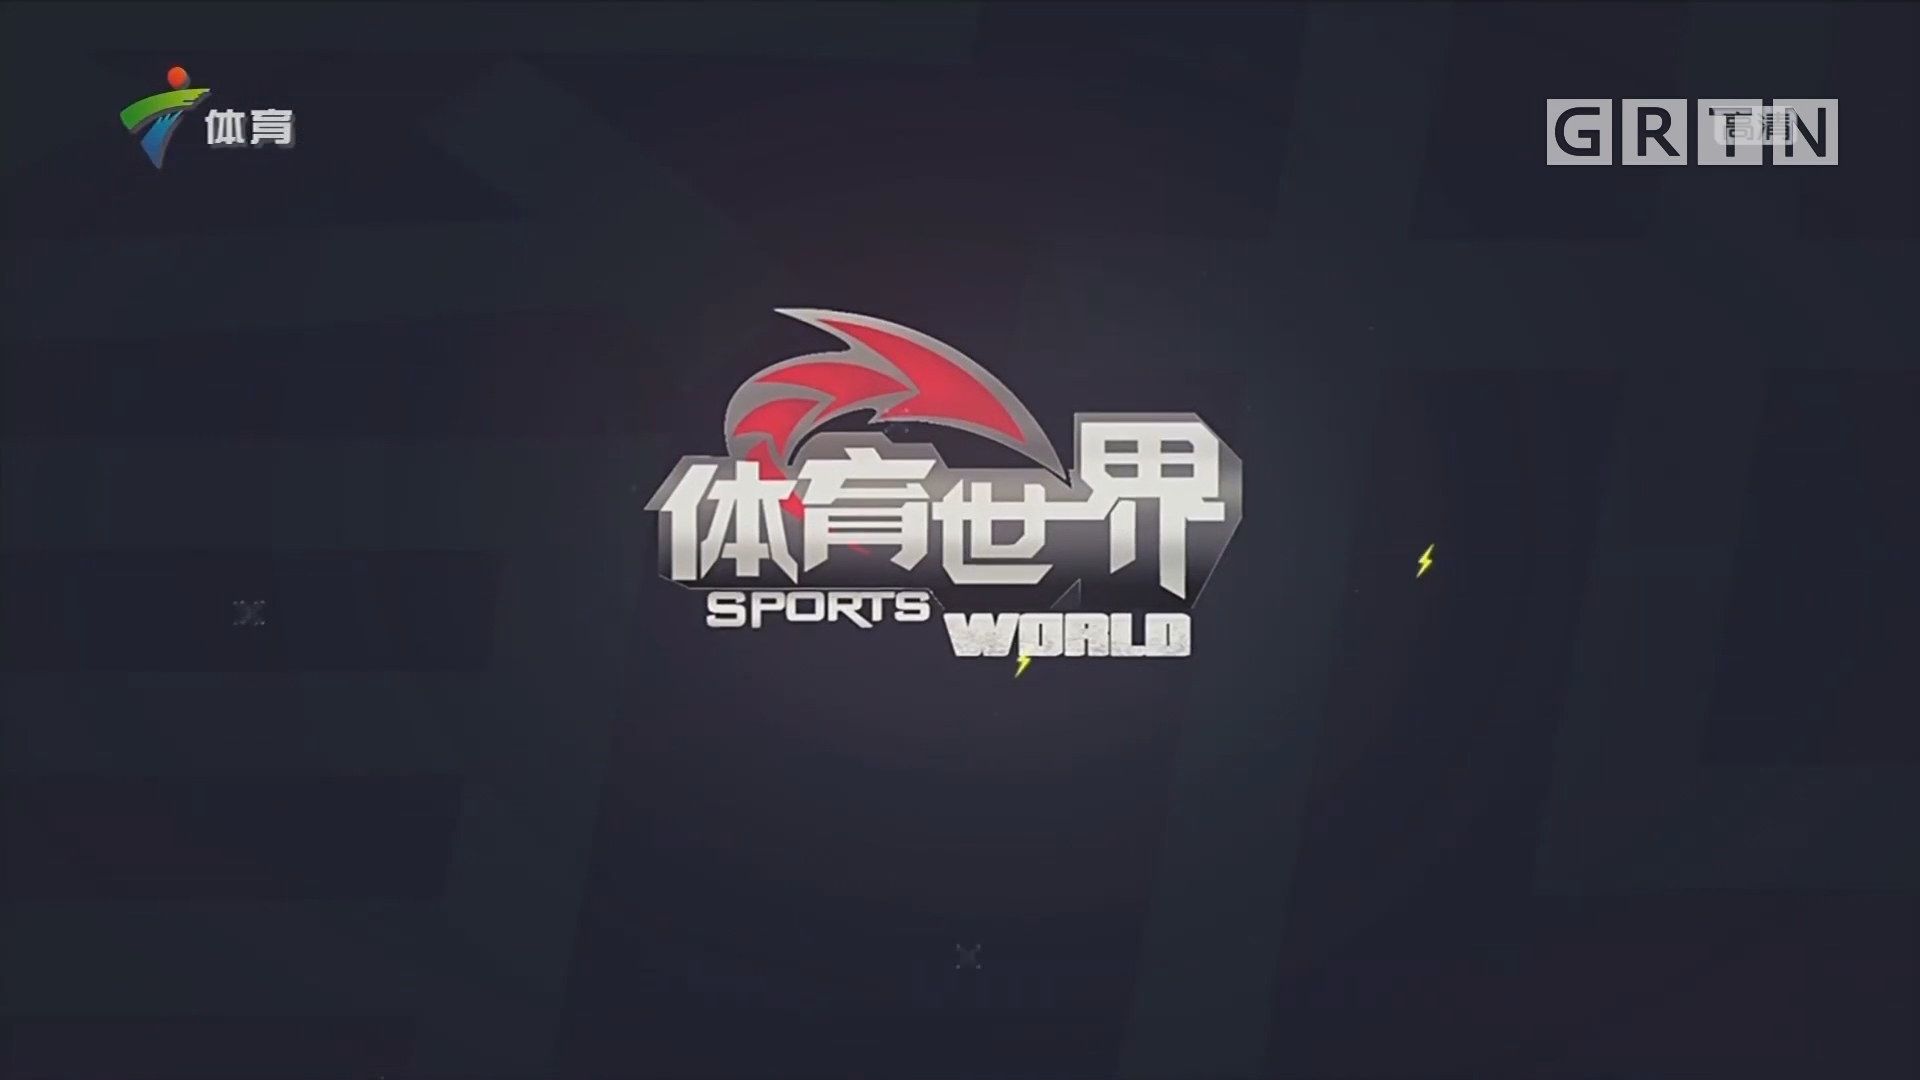 [HD][2019-09-12]体育世界:狗狗冲浪大赛 萌犬嗨翻天